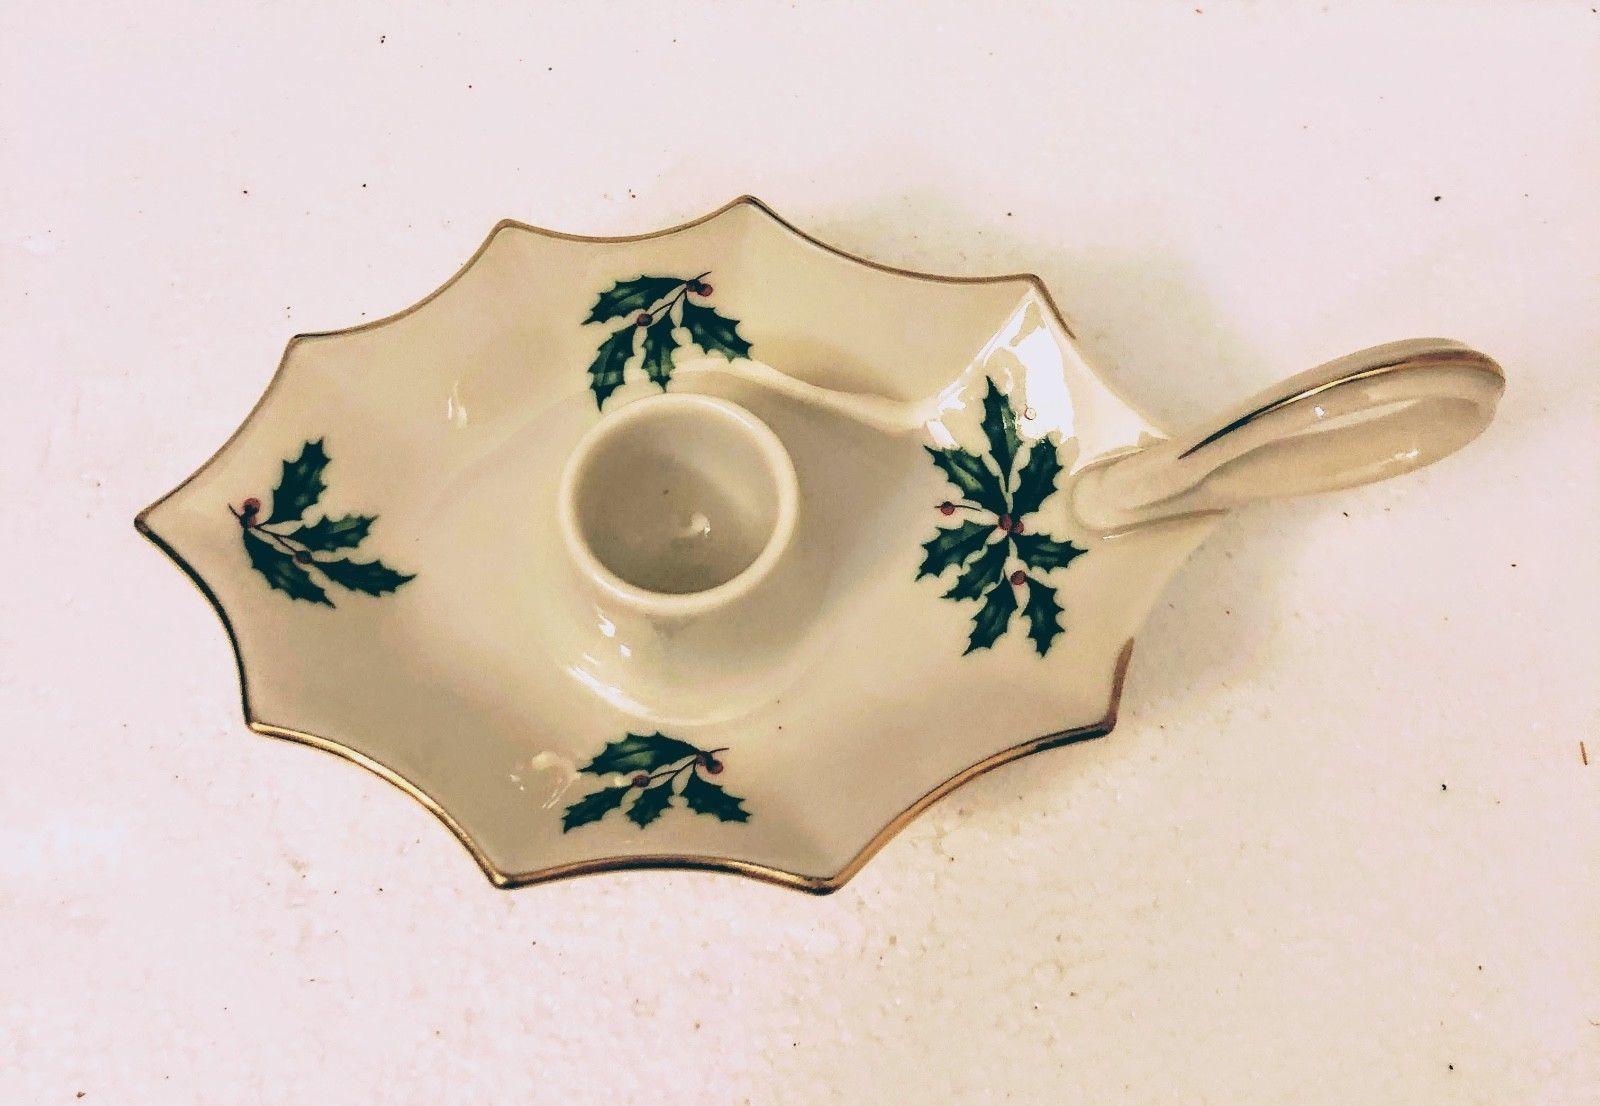 Lenox Porcelain Holiday Collection Candle Holder Christmas Decoration US Xmas